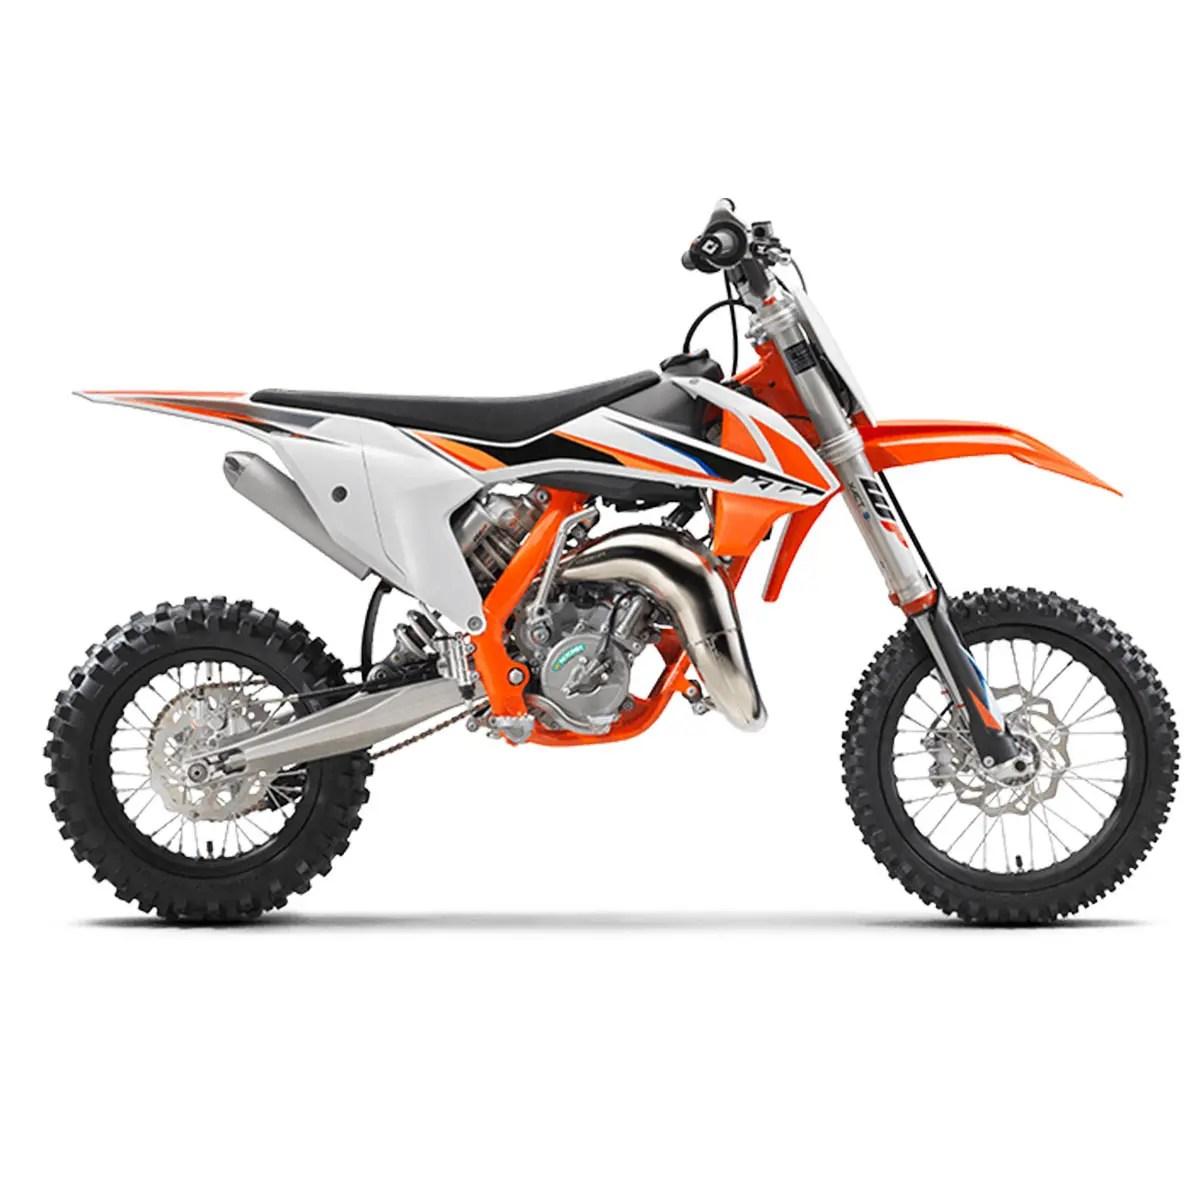 KTM-65-SX